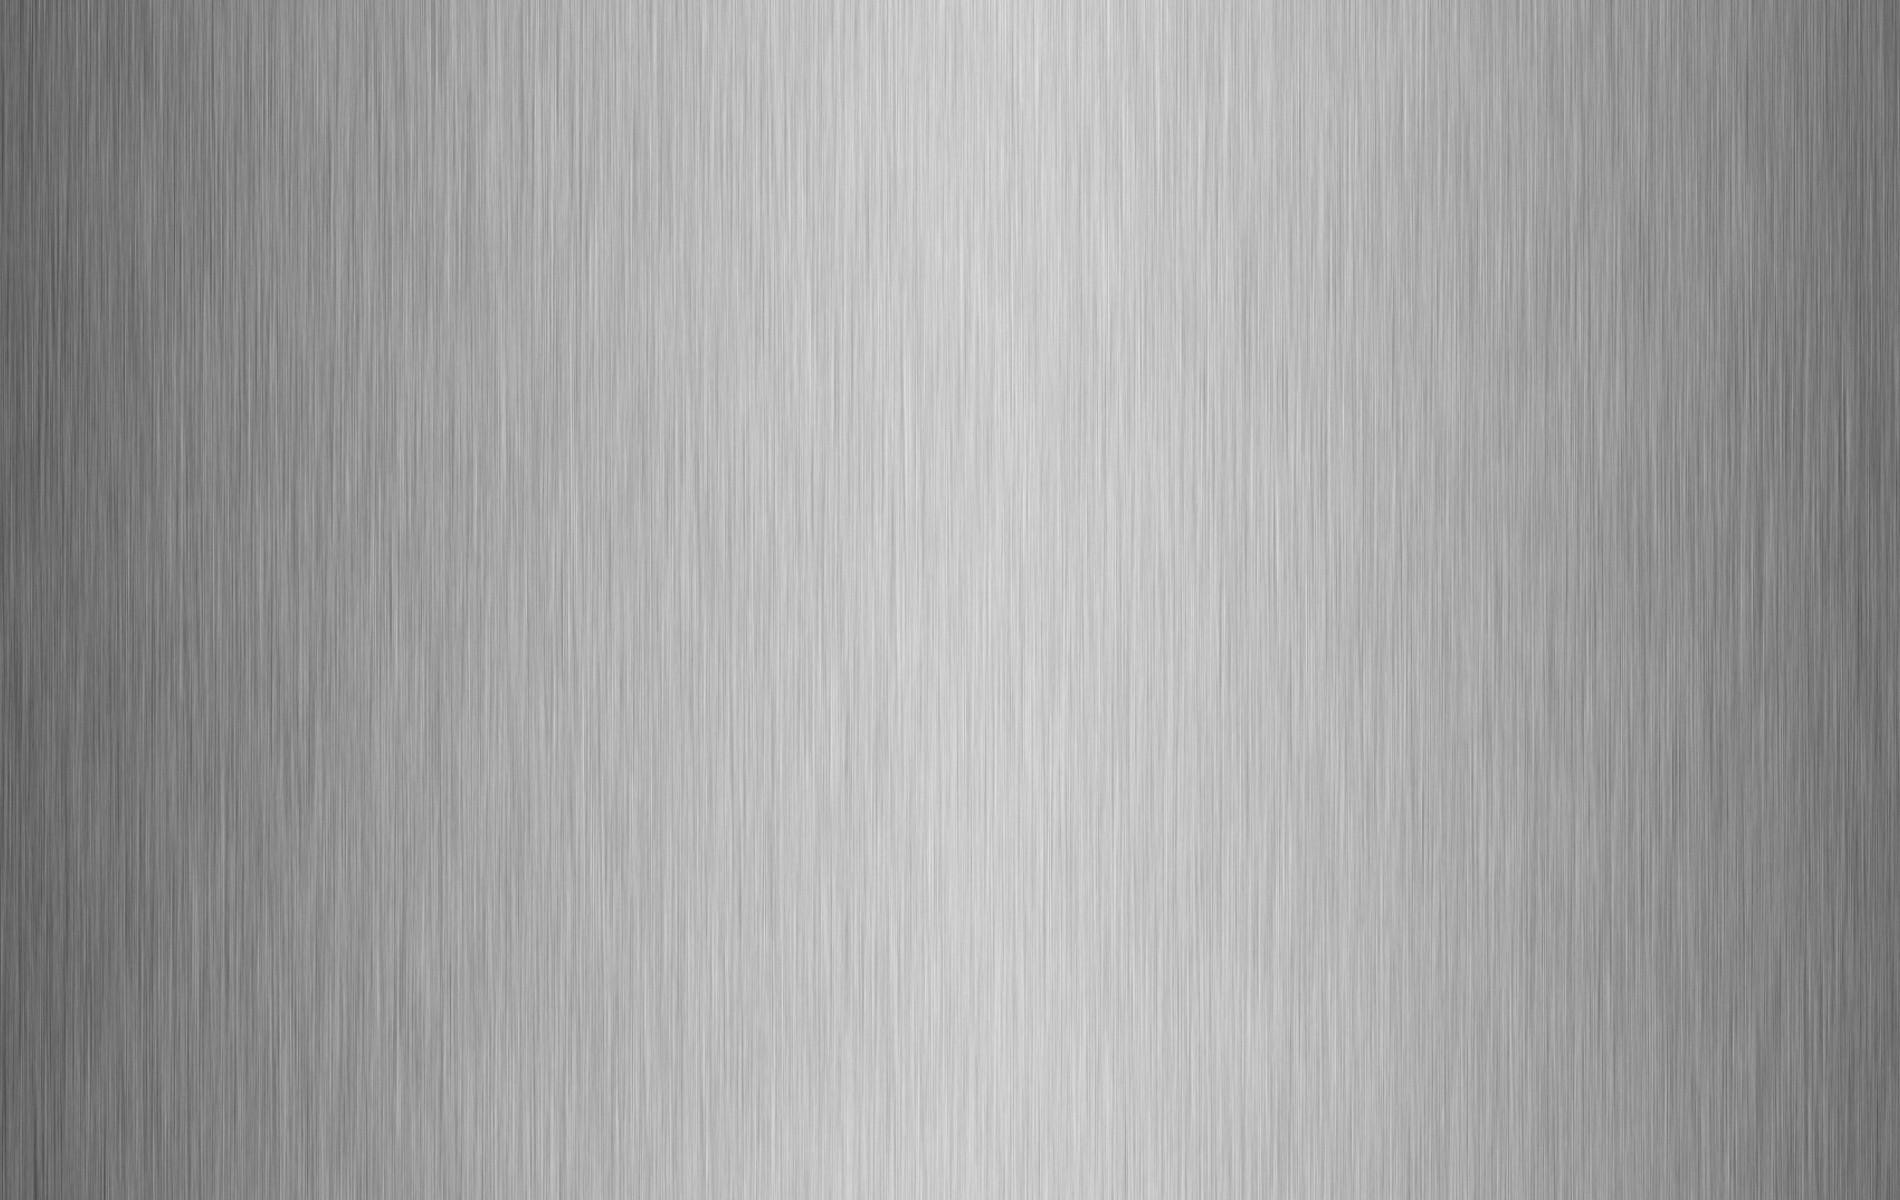 Wallpapers For Black Brushed Aluminum Wallpaper 1900x1200